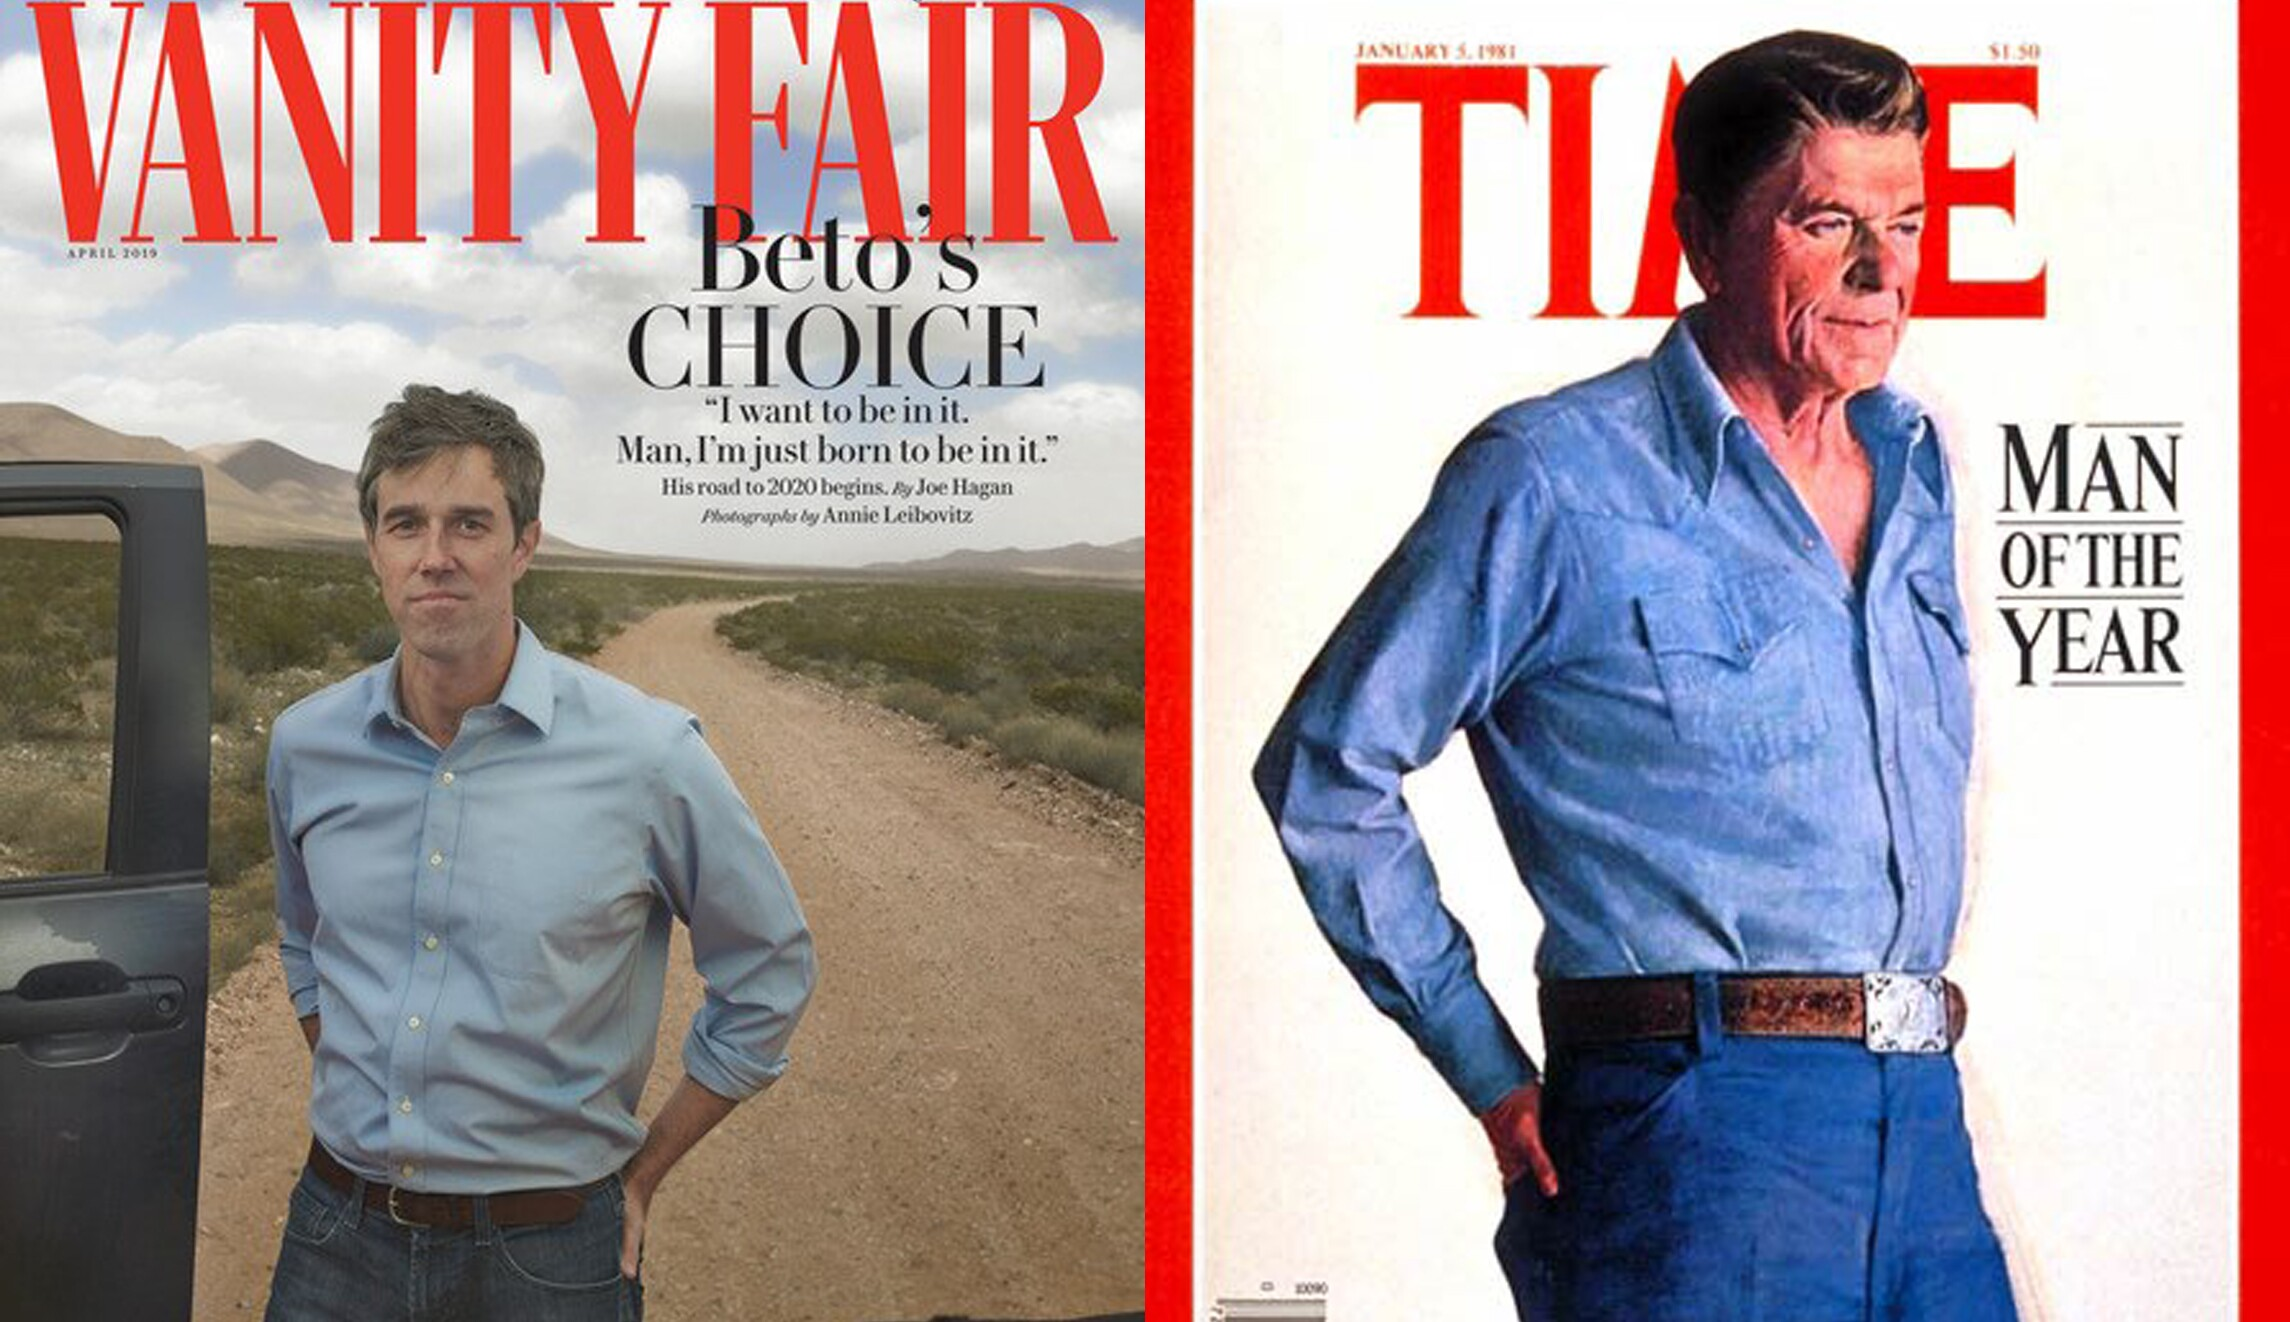 The new Reagan? Leibovitz photo of Beto O'Rourke echoes iconic portrait of GOP president